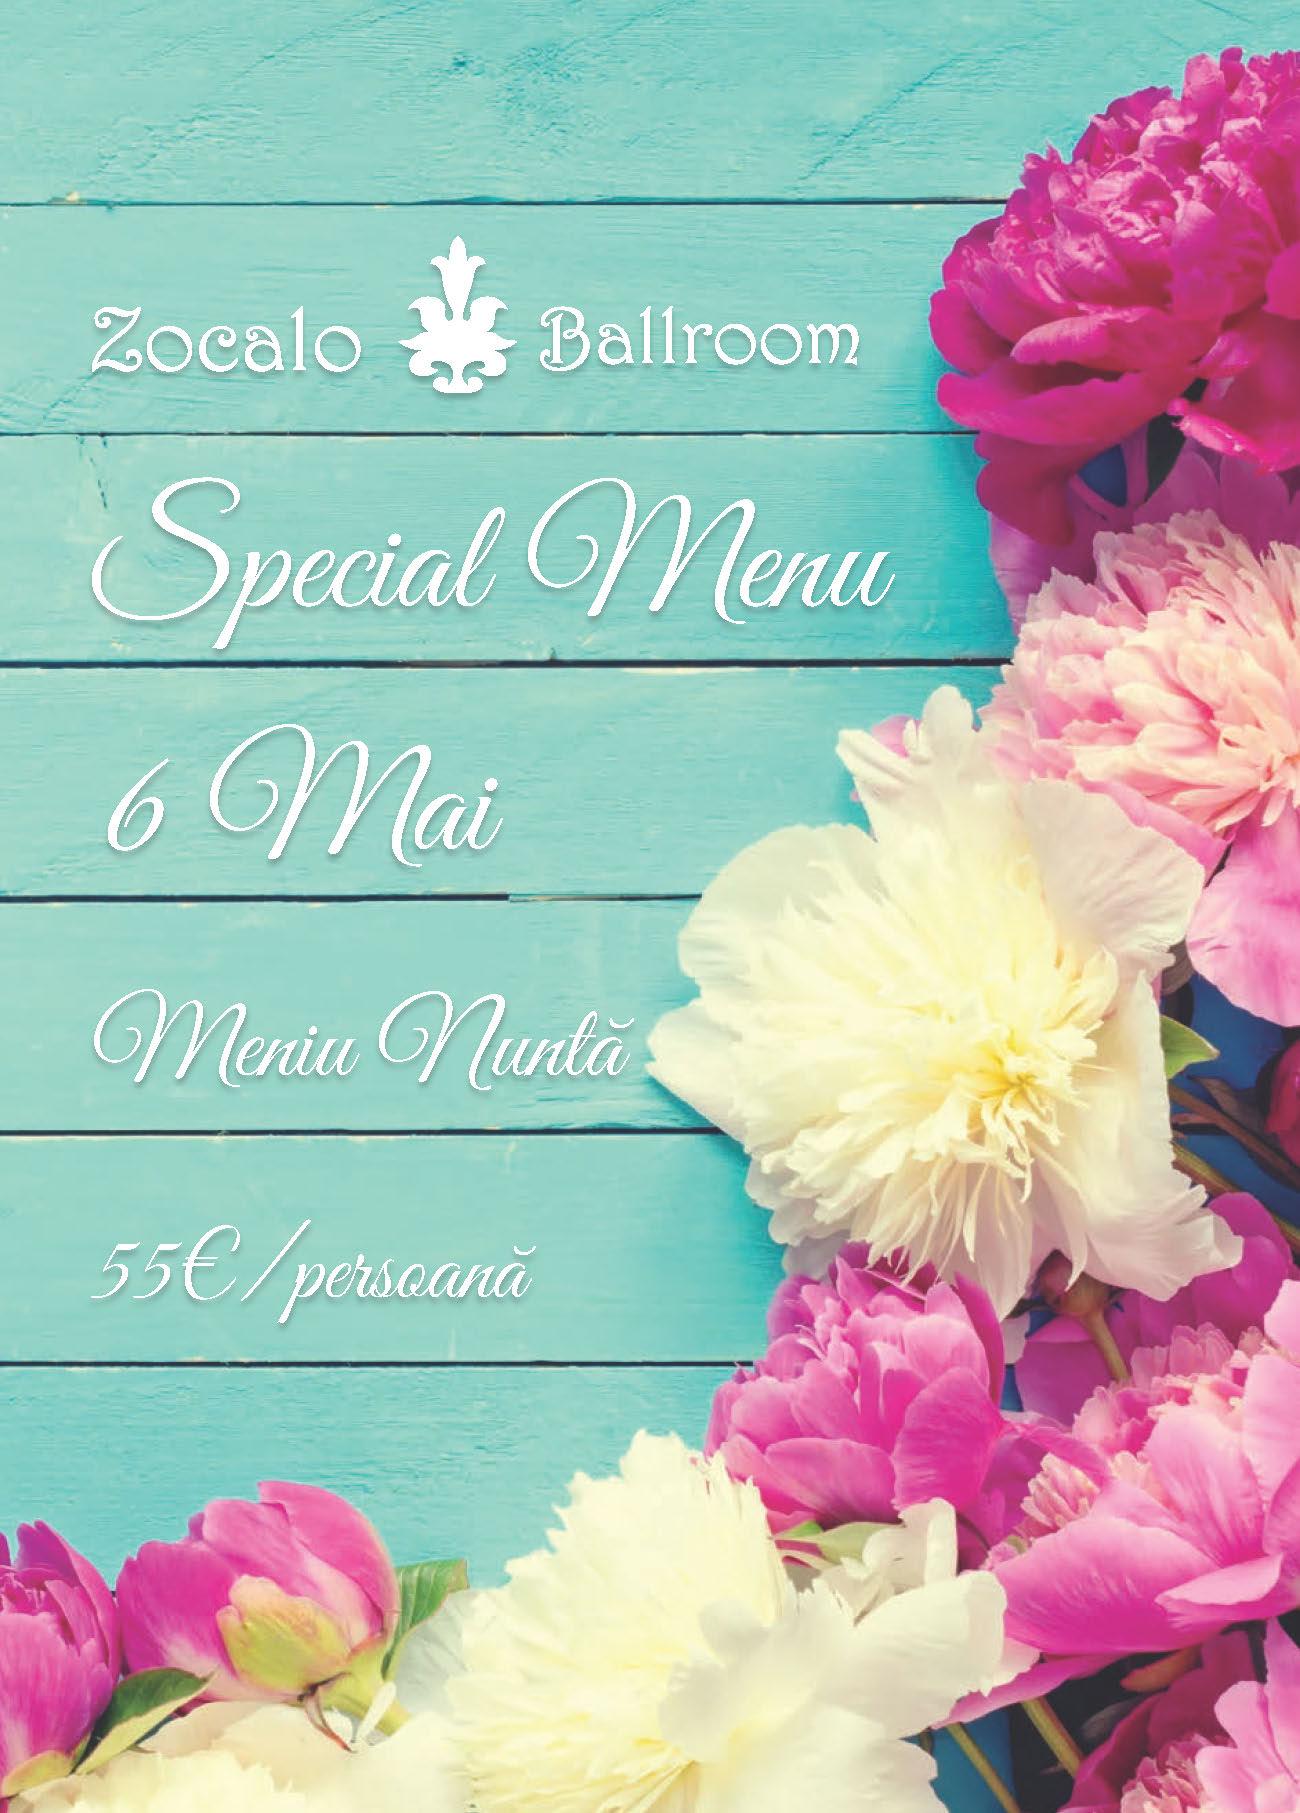 Oferta 6 mai nunta_Page_1